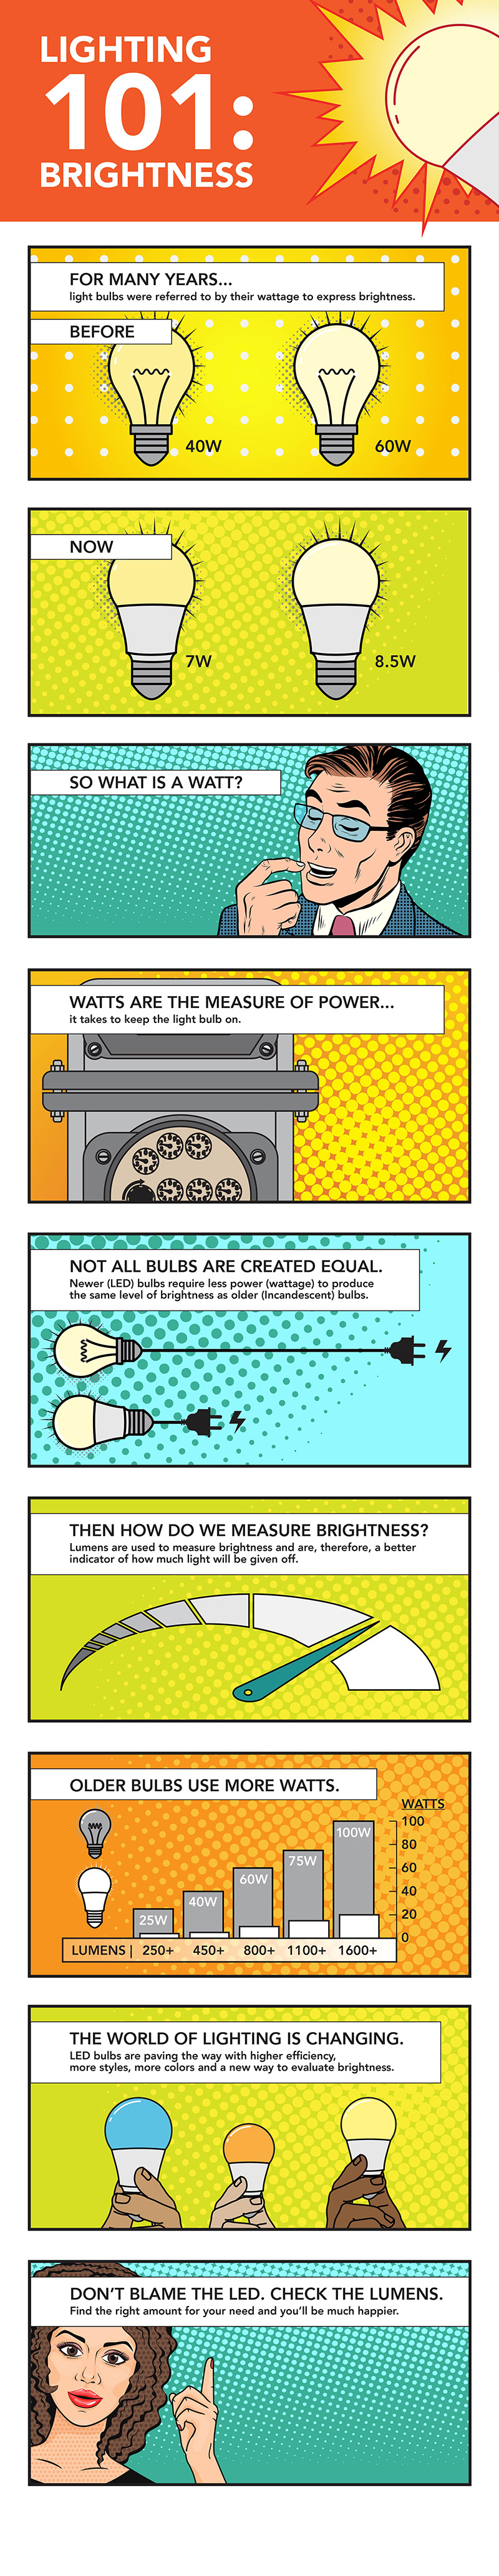 Lighting 101: Brightness